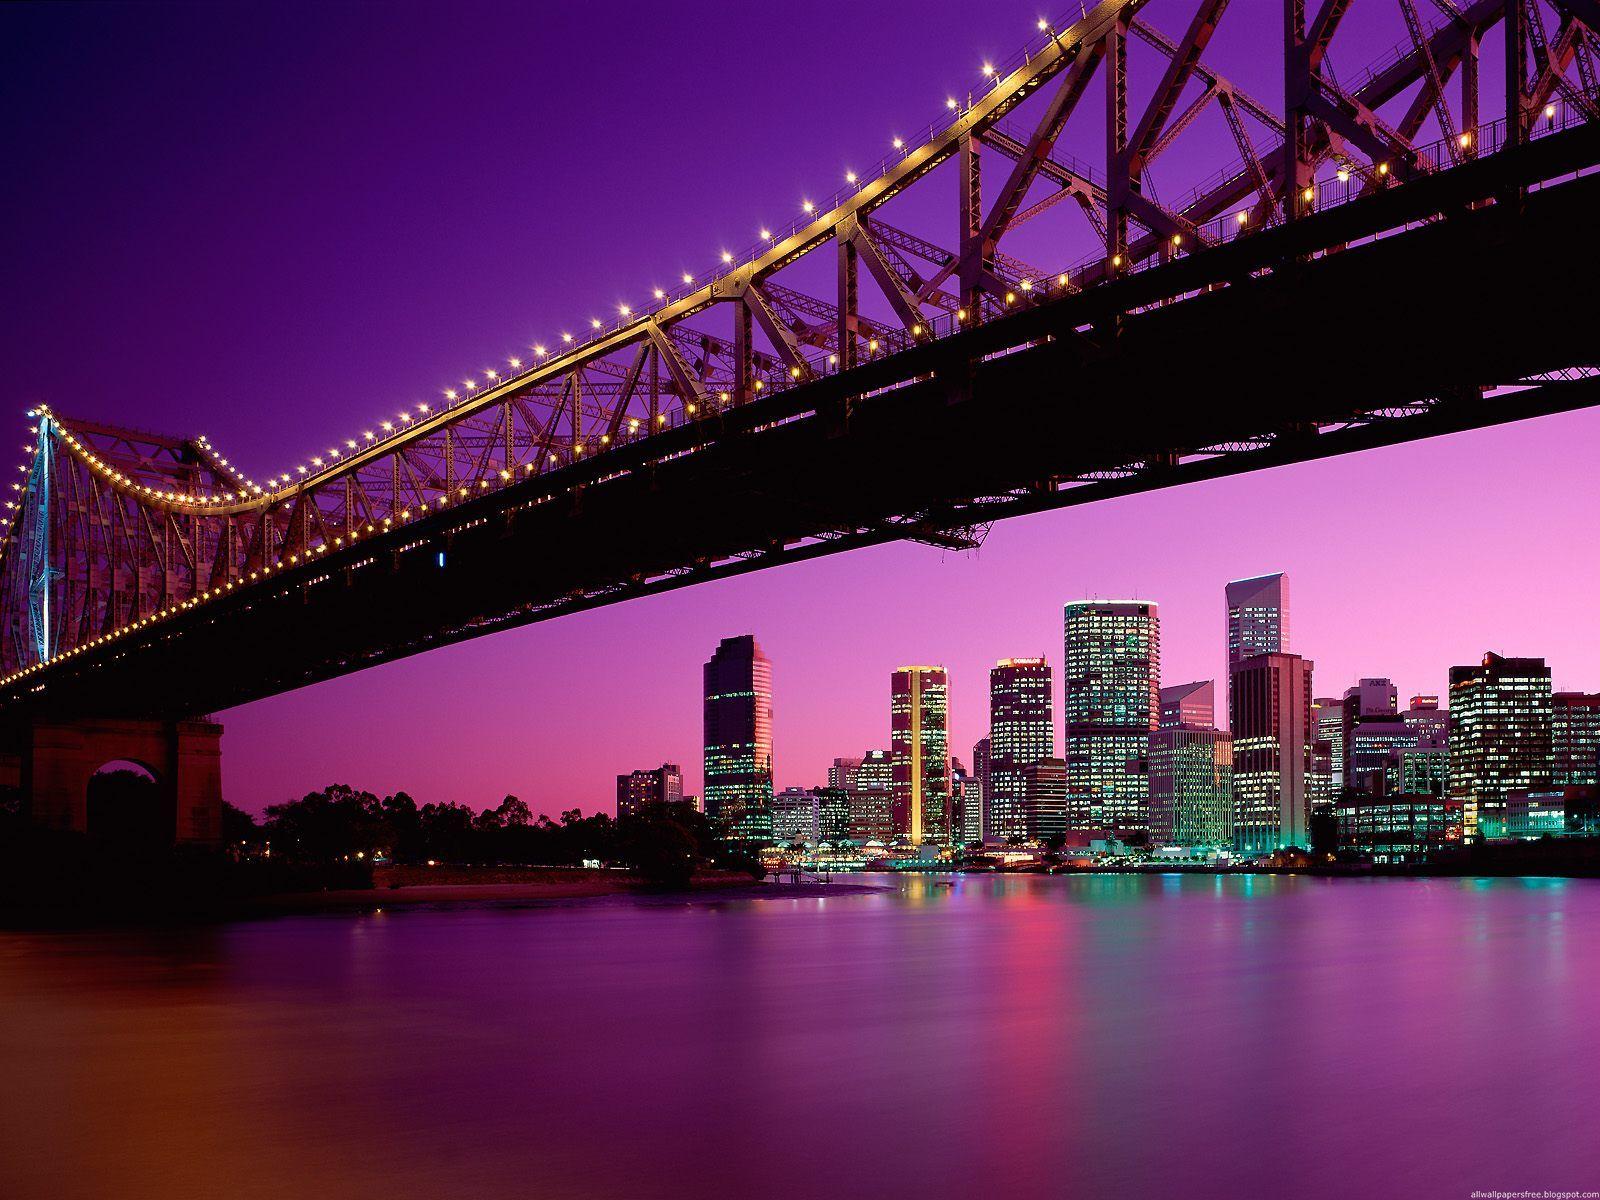 Australia Landscape Wallpapers 1600 X 1200   Photo 28 of 35 phombo 1600x1200